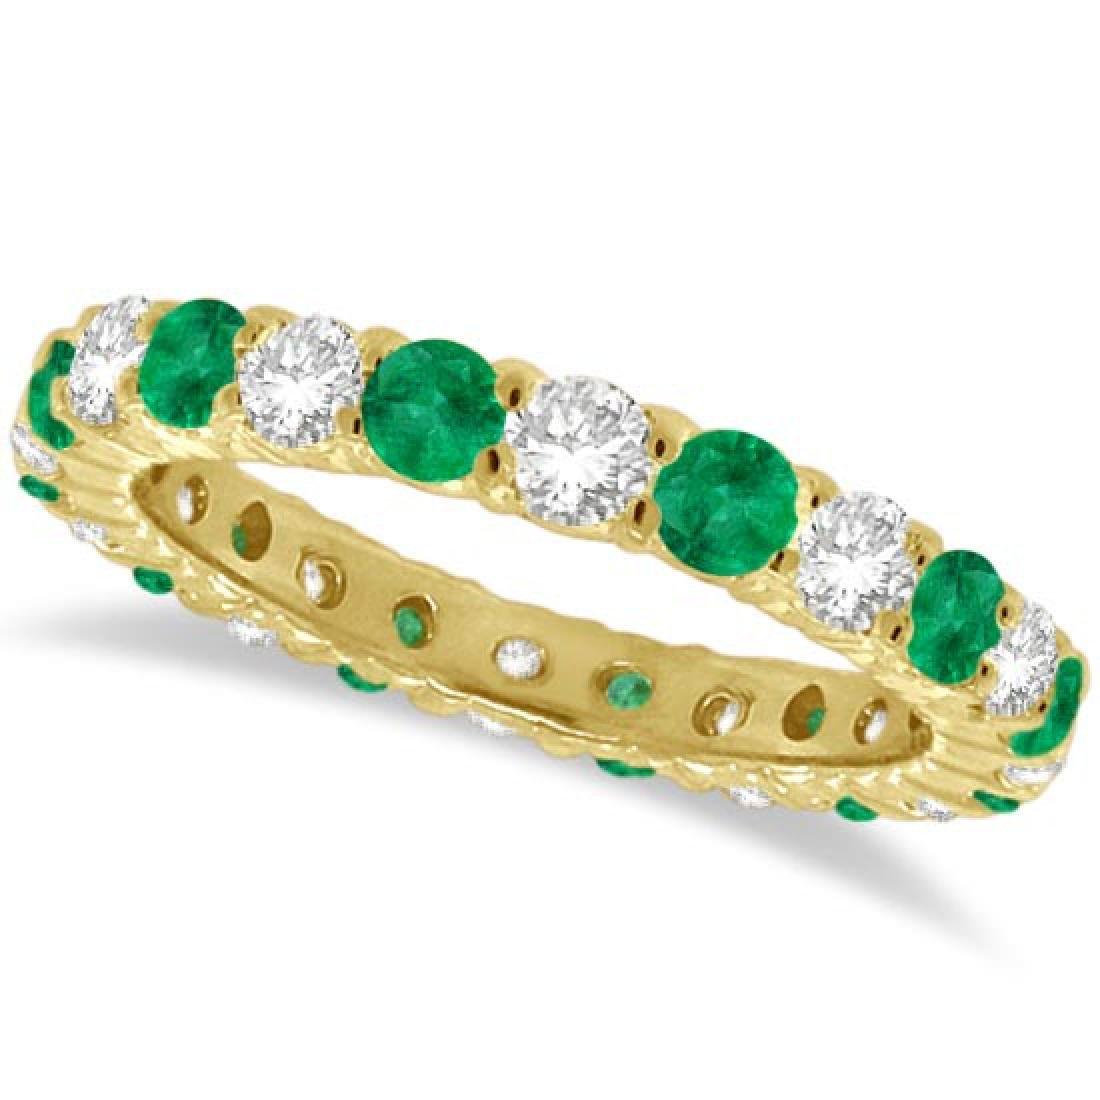 Emerald and Diamond Eternity Ring Band 14k Yellow Gold